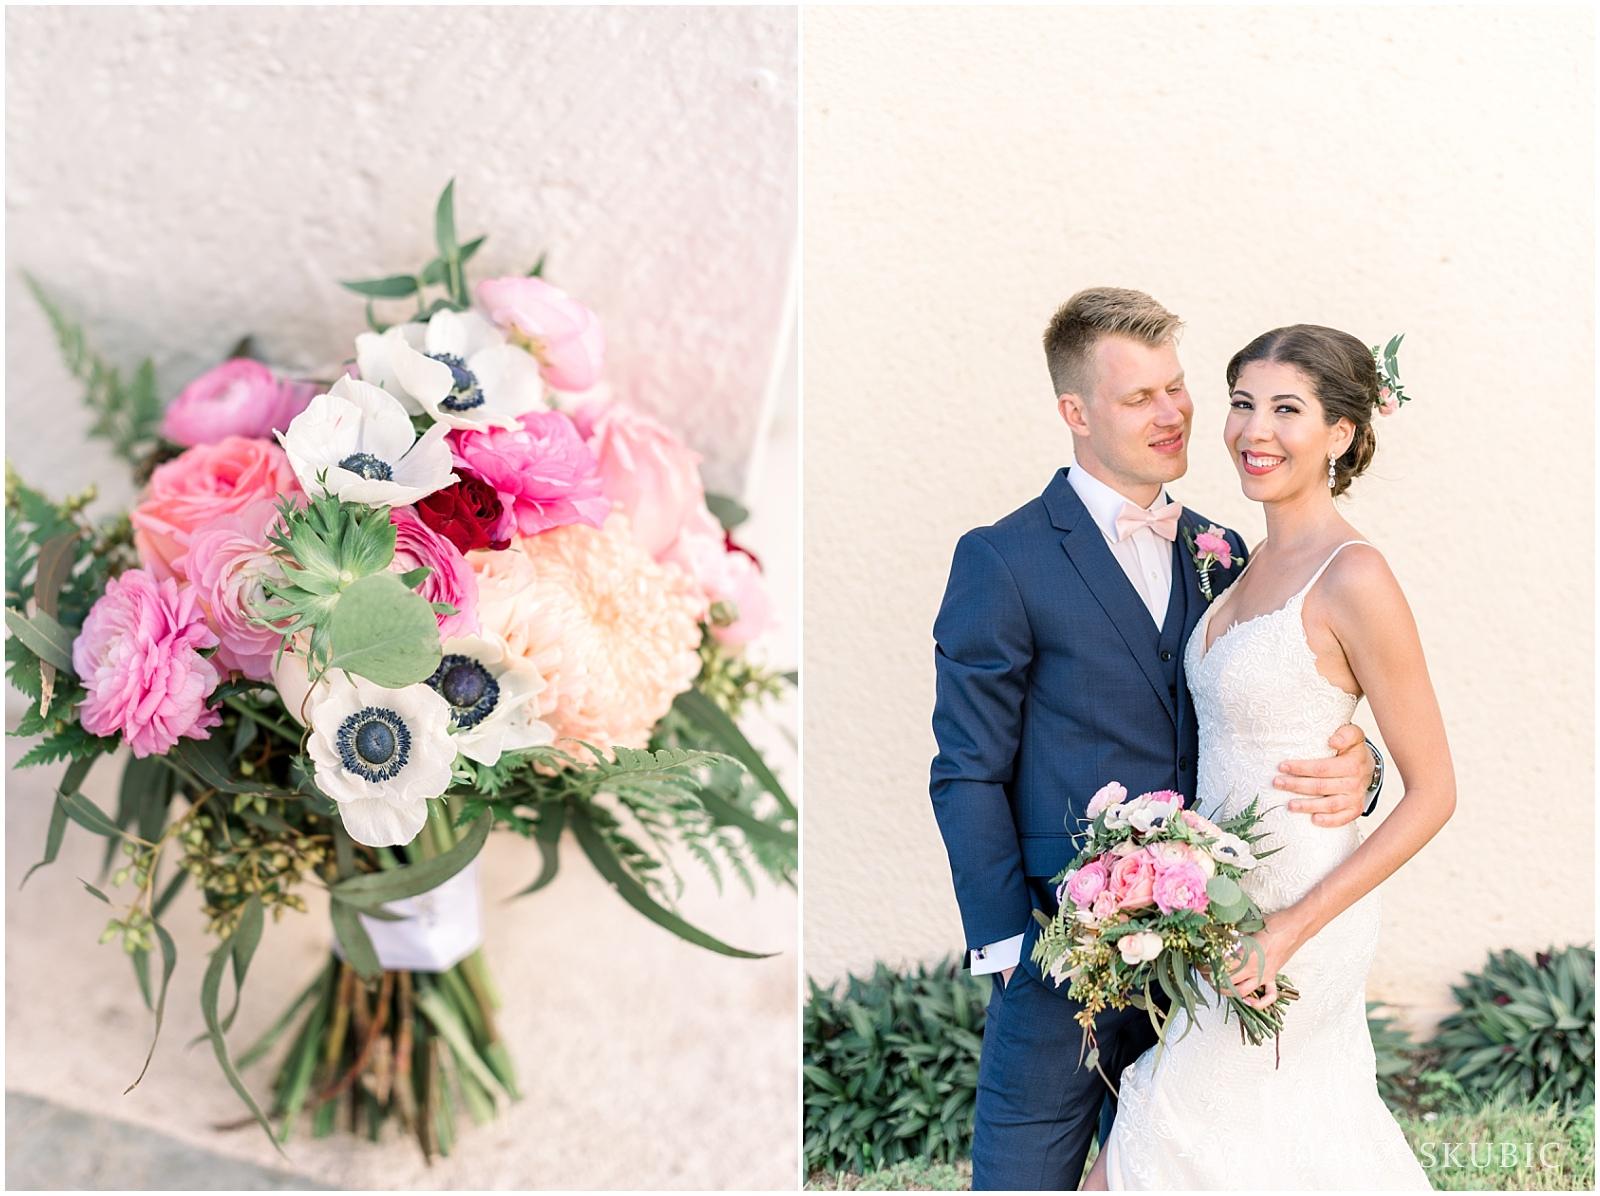 TJ_Now_Sapphire_Riviera_Cancun_Mexico_Wedding_Photos_0195.jpg